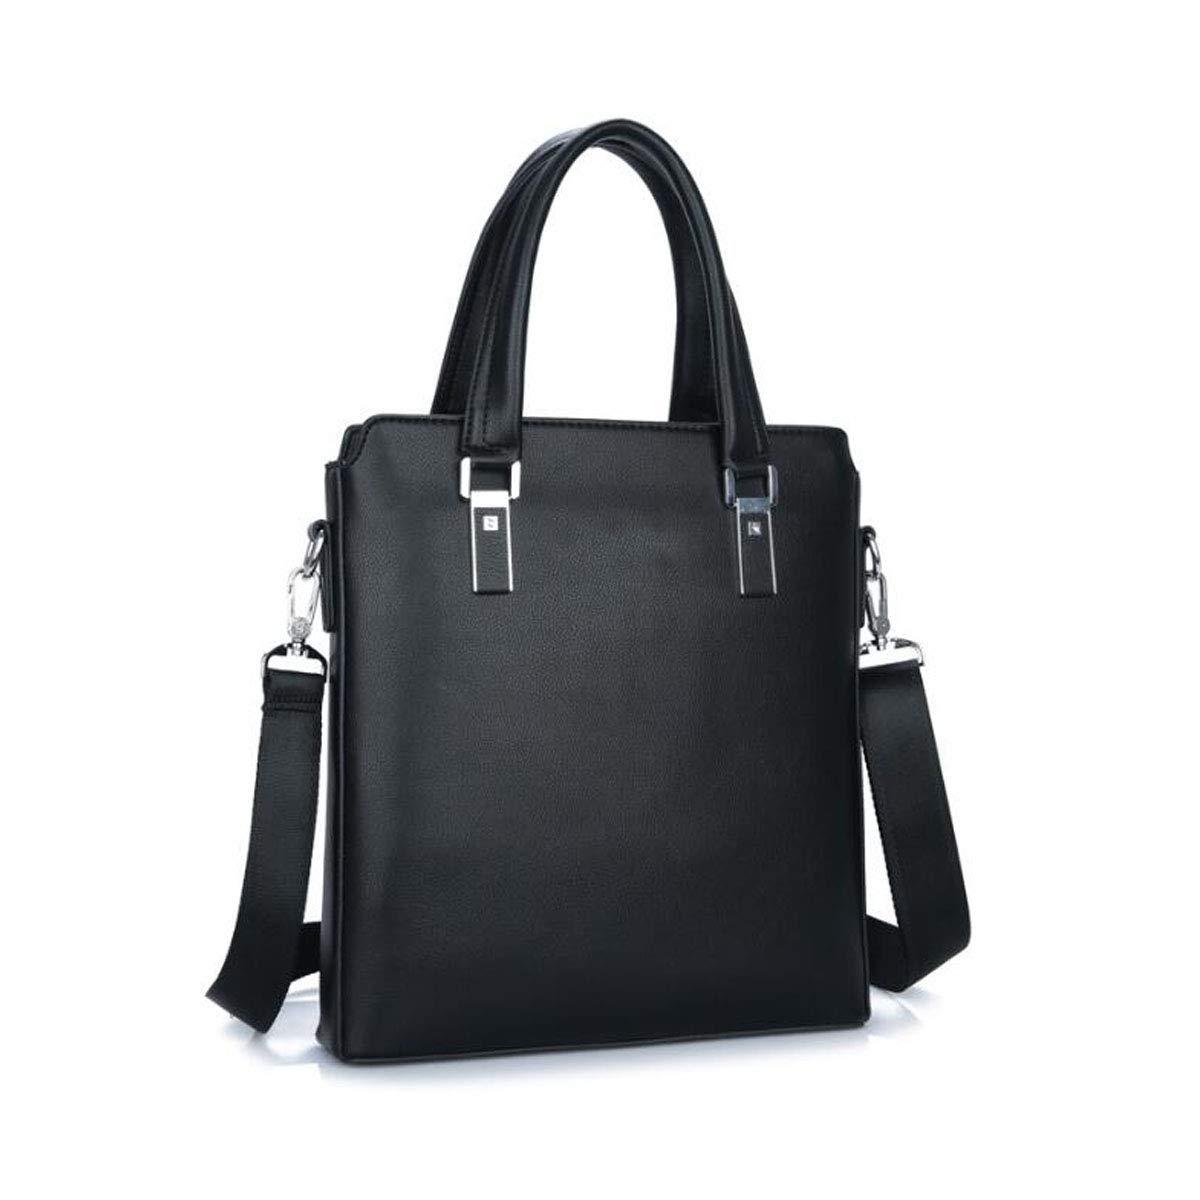 Mens PU Leather Color : Black Aishanghuayi Briefcase Travel Size: 29832cm Durable Suitable for Work Business Shoulder-Slung Computer Bag